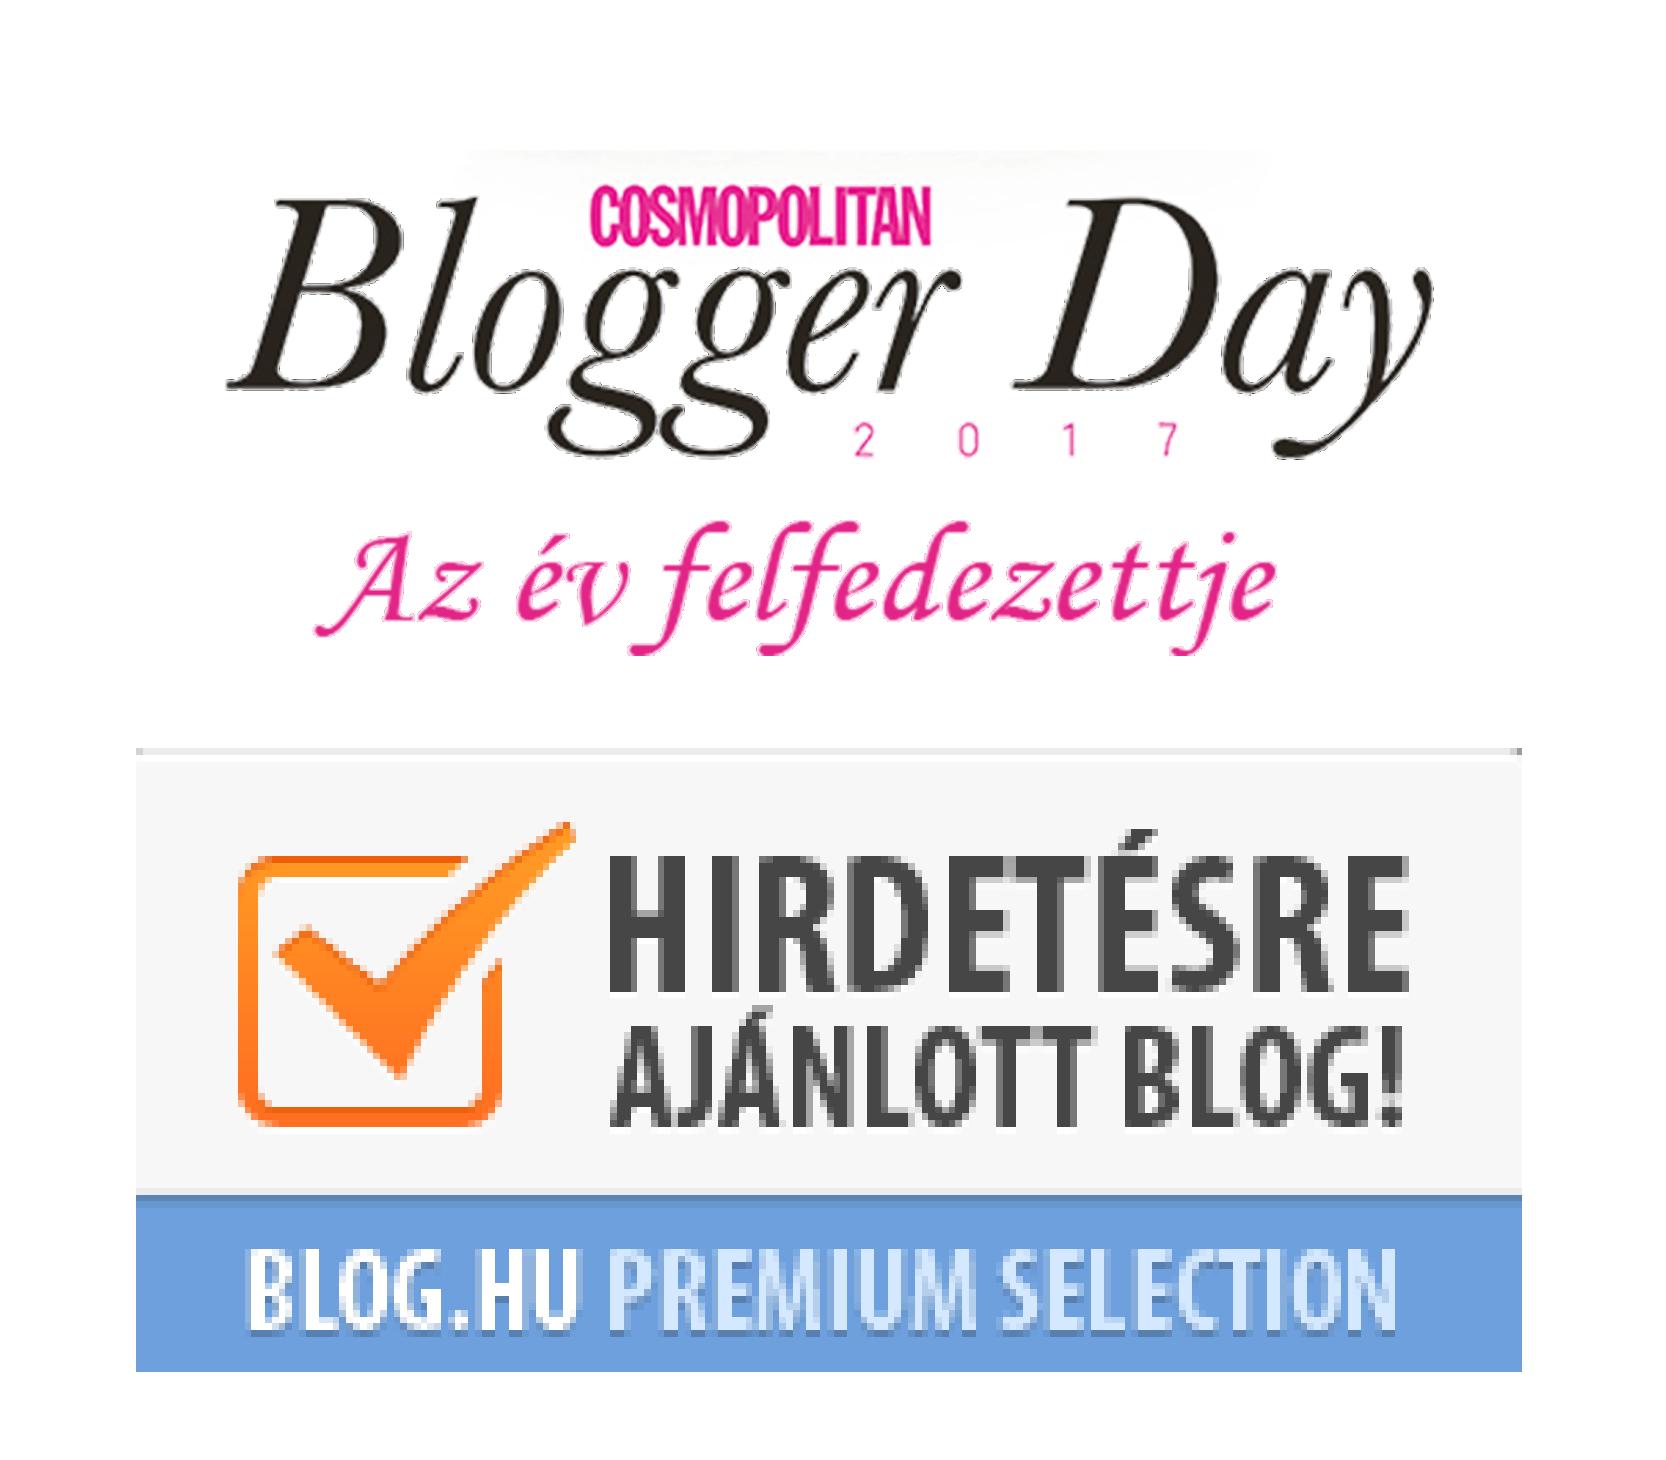 blogozine.png